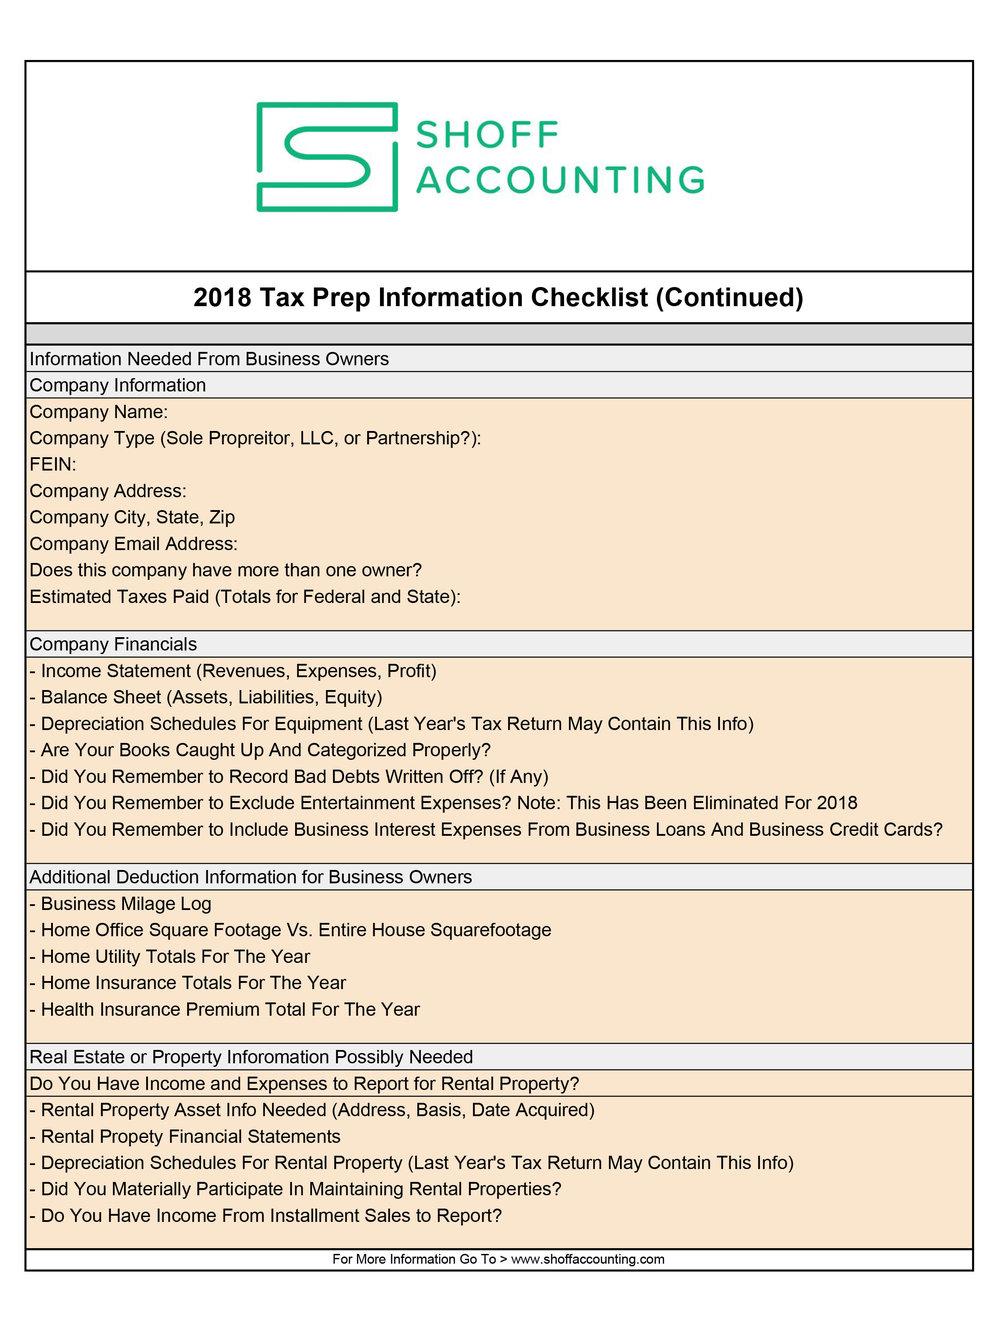 2018 Tax Information Checklist - Feb 2019 - Sheet2.jpg